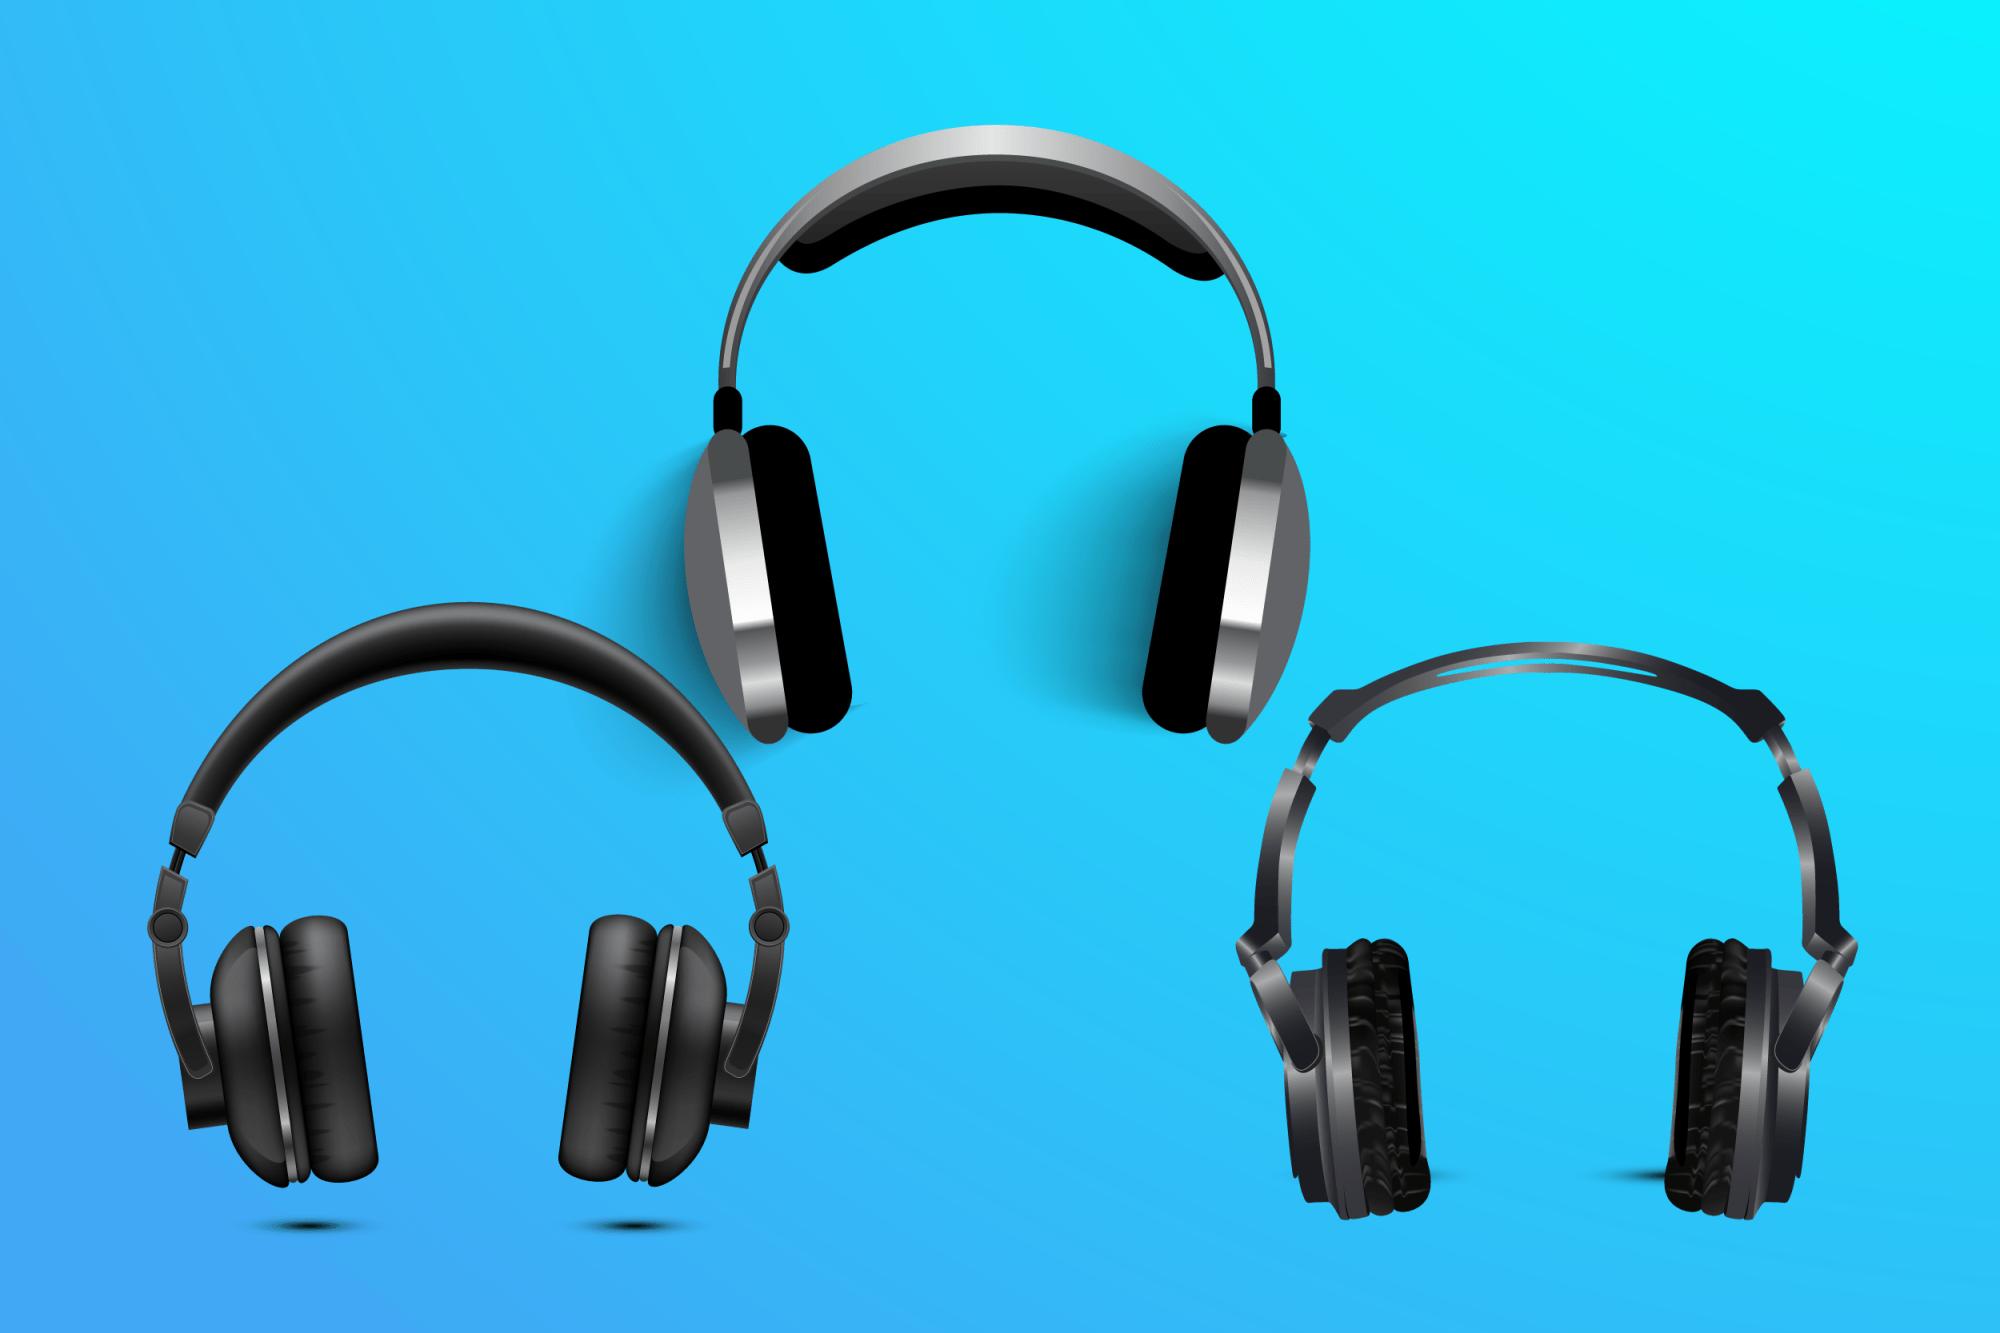 hight resolution of different brands of headphones